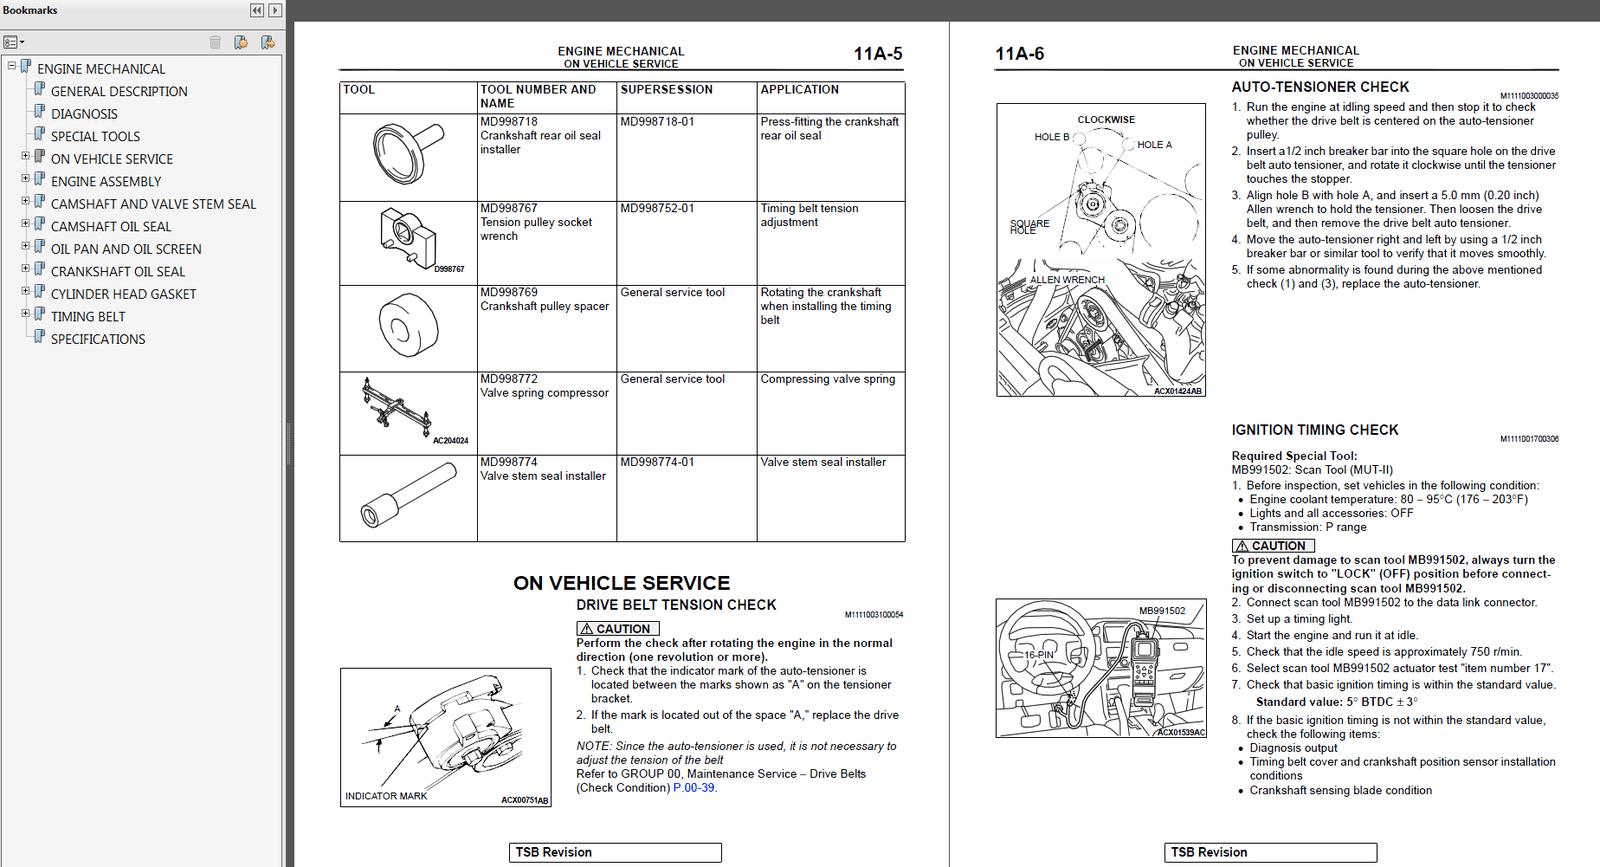 2003 Mitsubishi Montero Factory Repair Service Manual MSSP